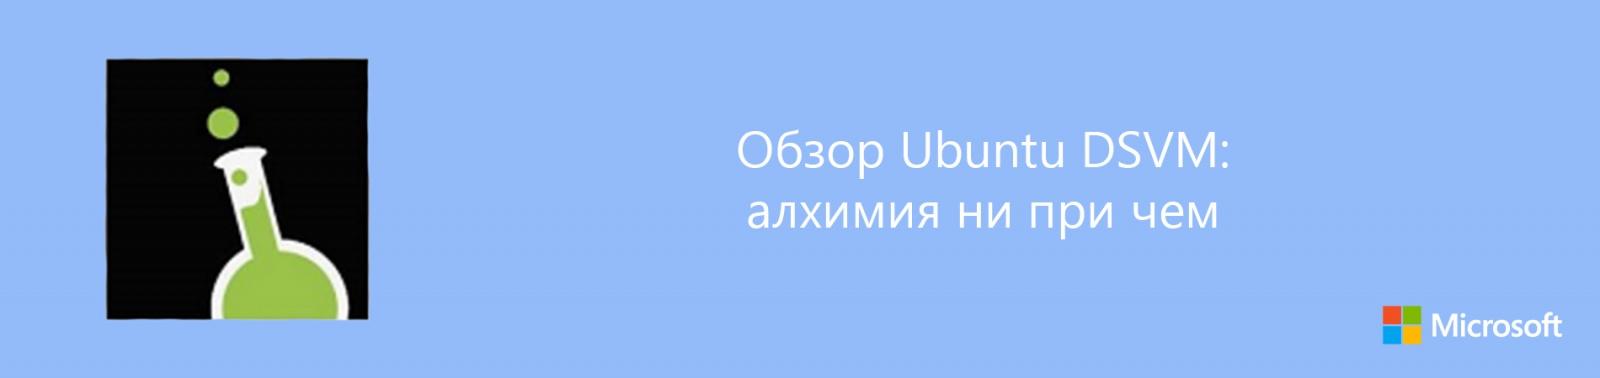 Обзор Ubuntu DSVM: алхимия ни при чём - 1